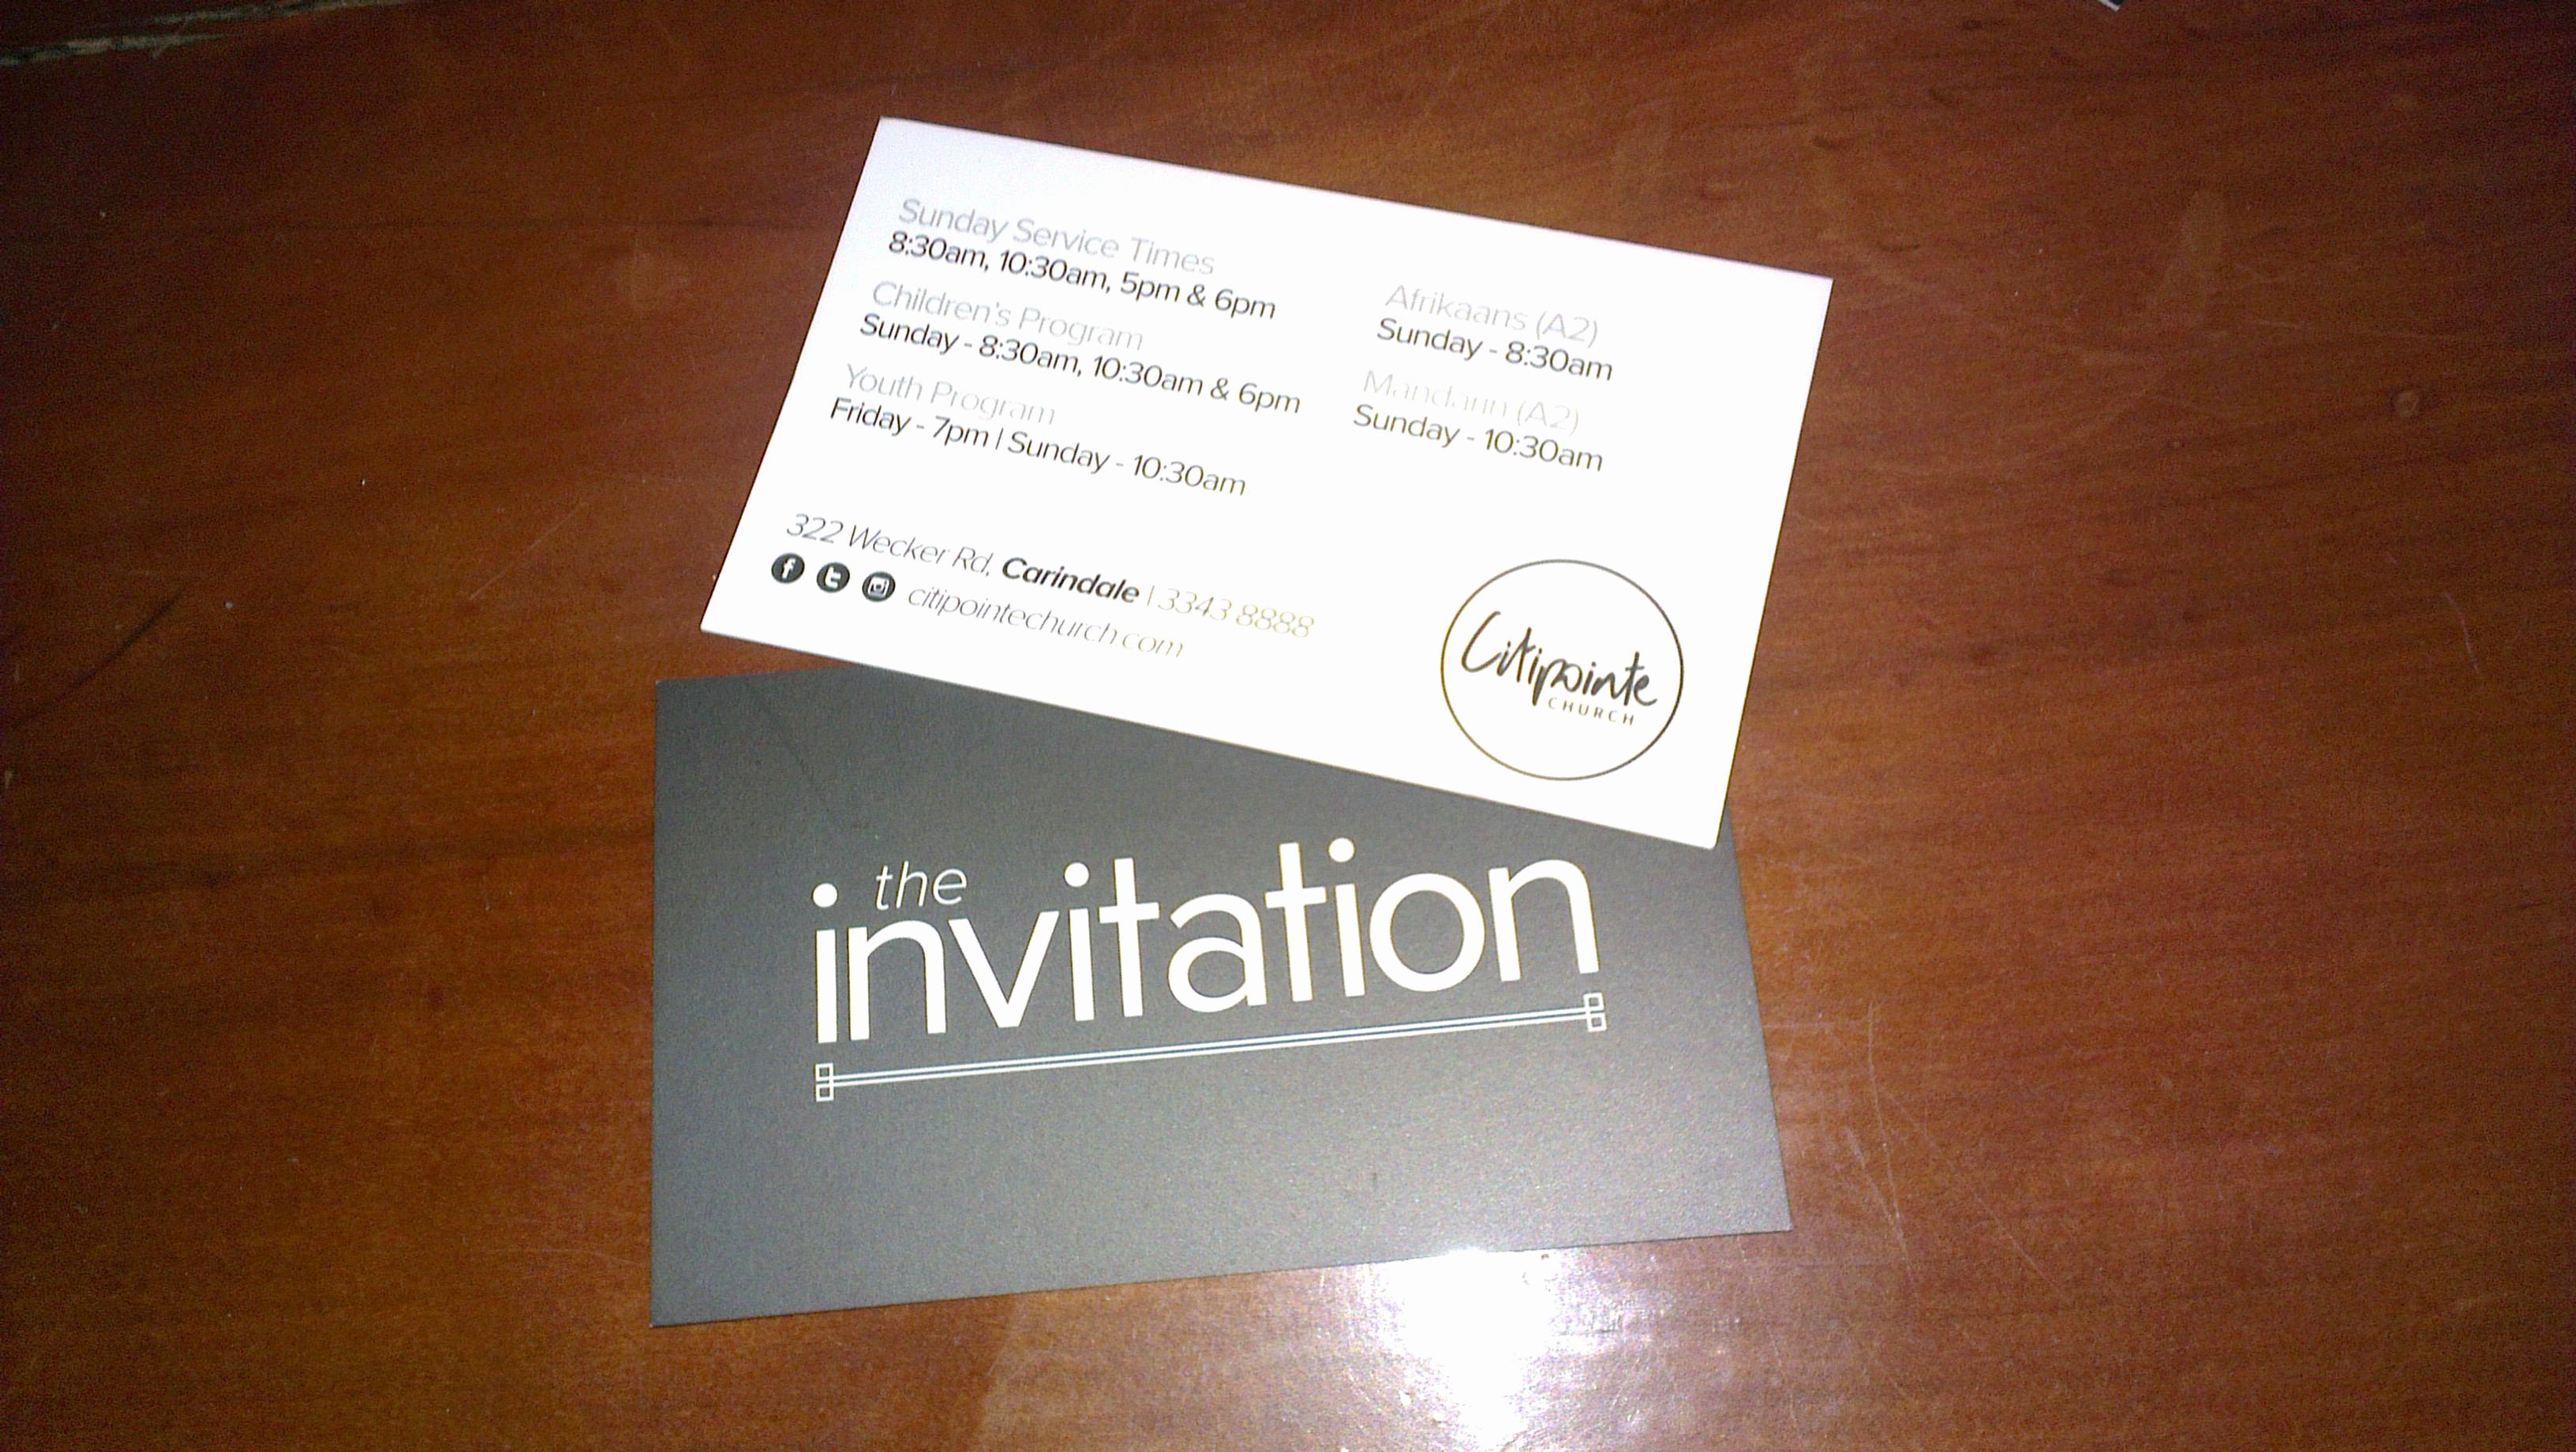 Church Invitation Cards Templates Lovely Church Invite Cards Creative Church Invite Cards